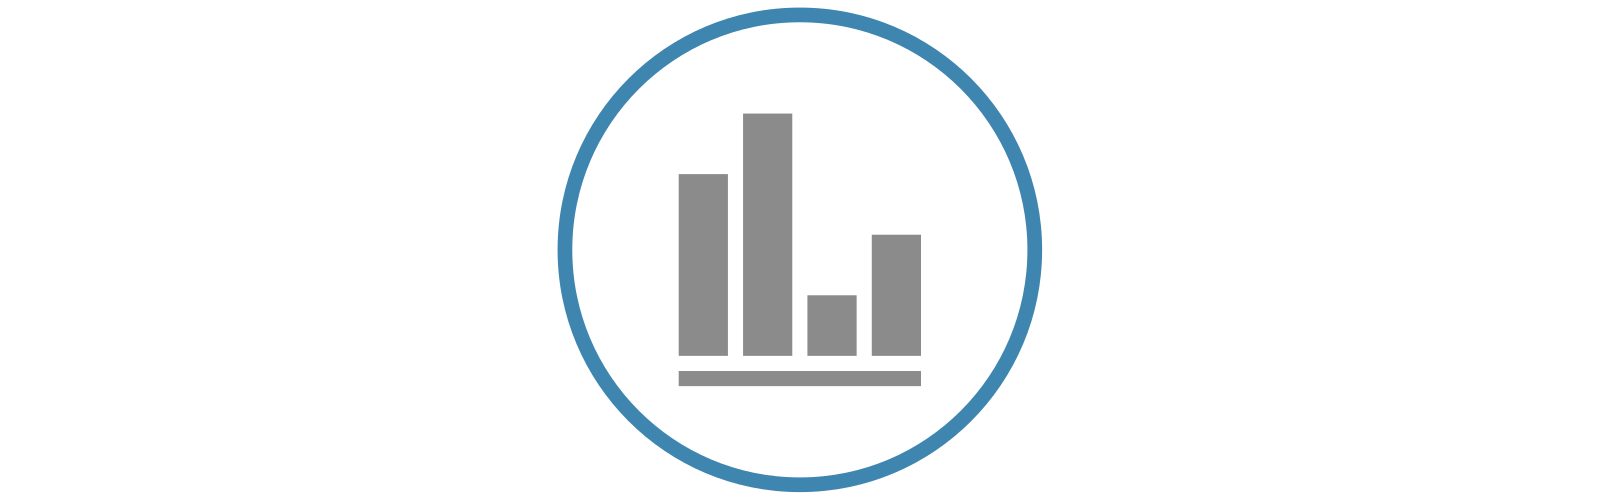 PollBot Logo